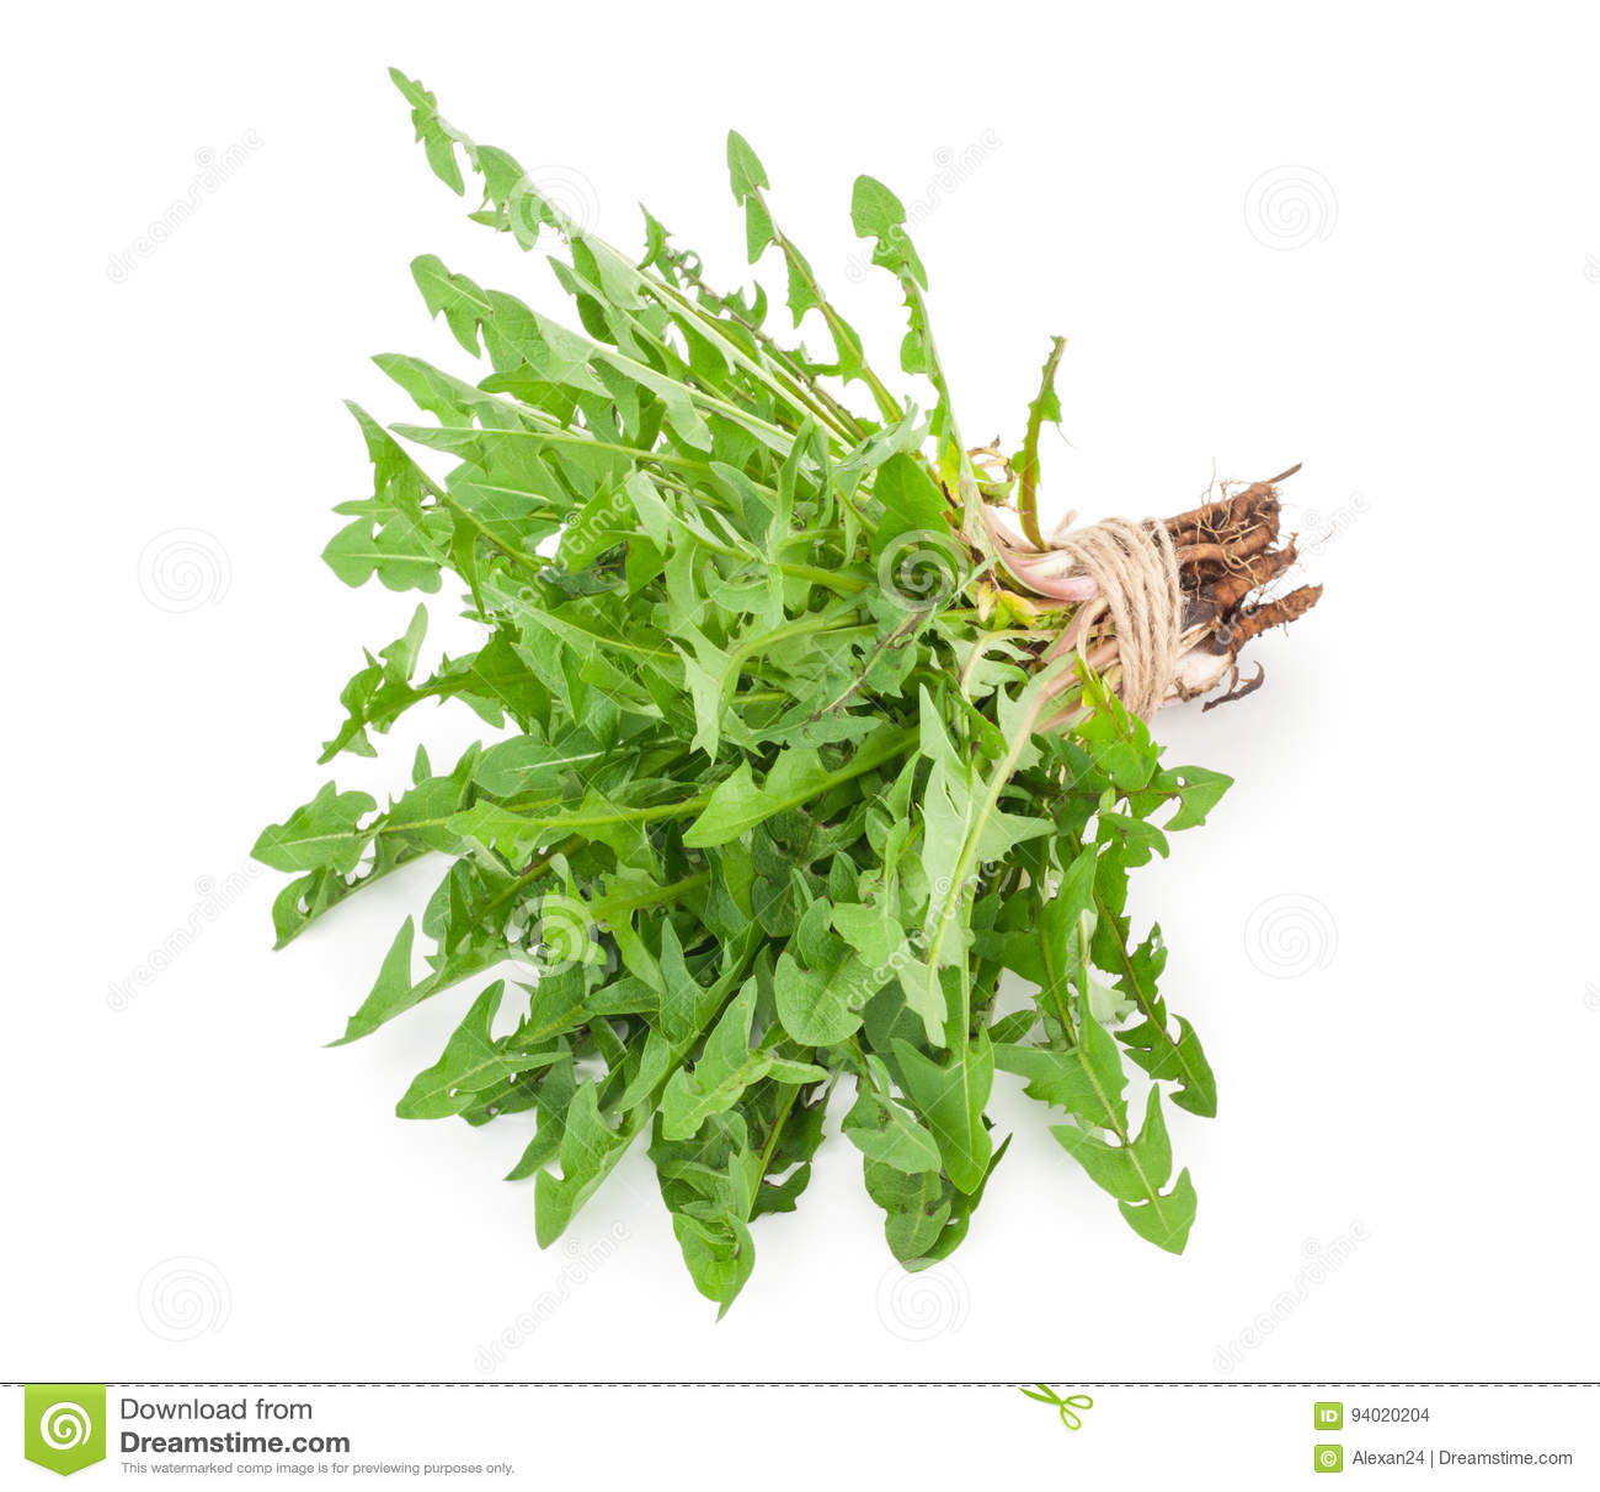 Dandelion herbs